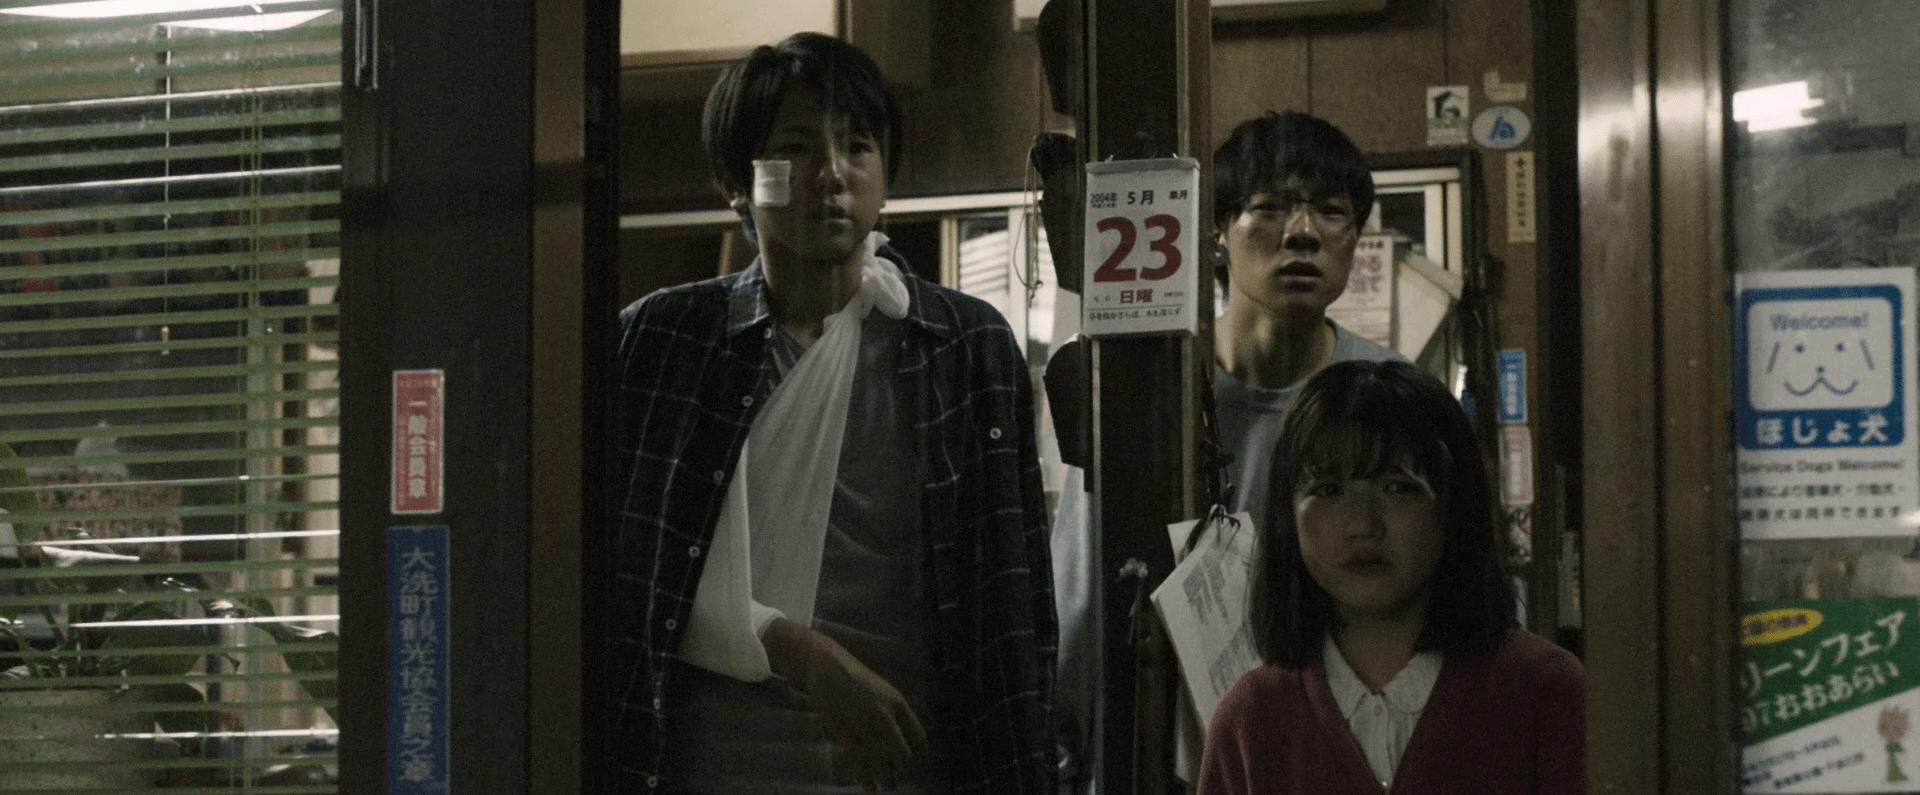 One Night (2019) by Kazuya Shiraishi